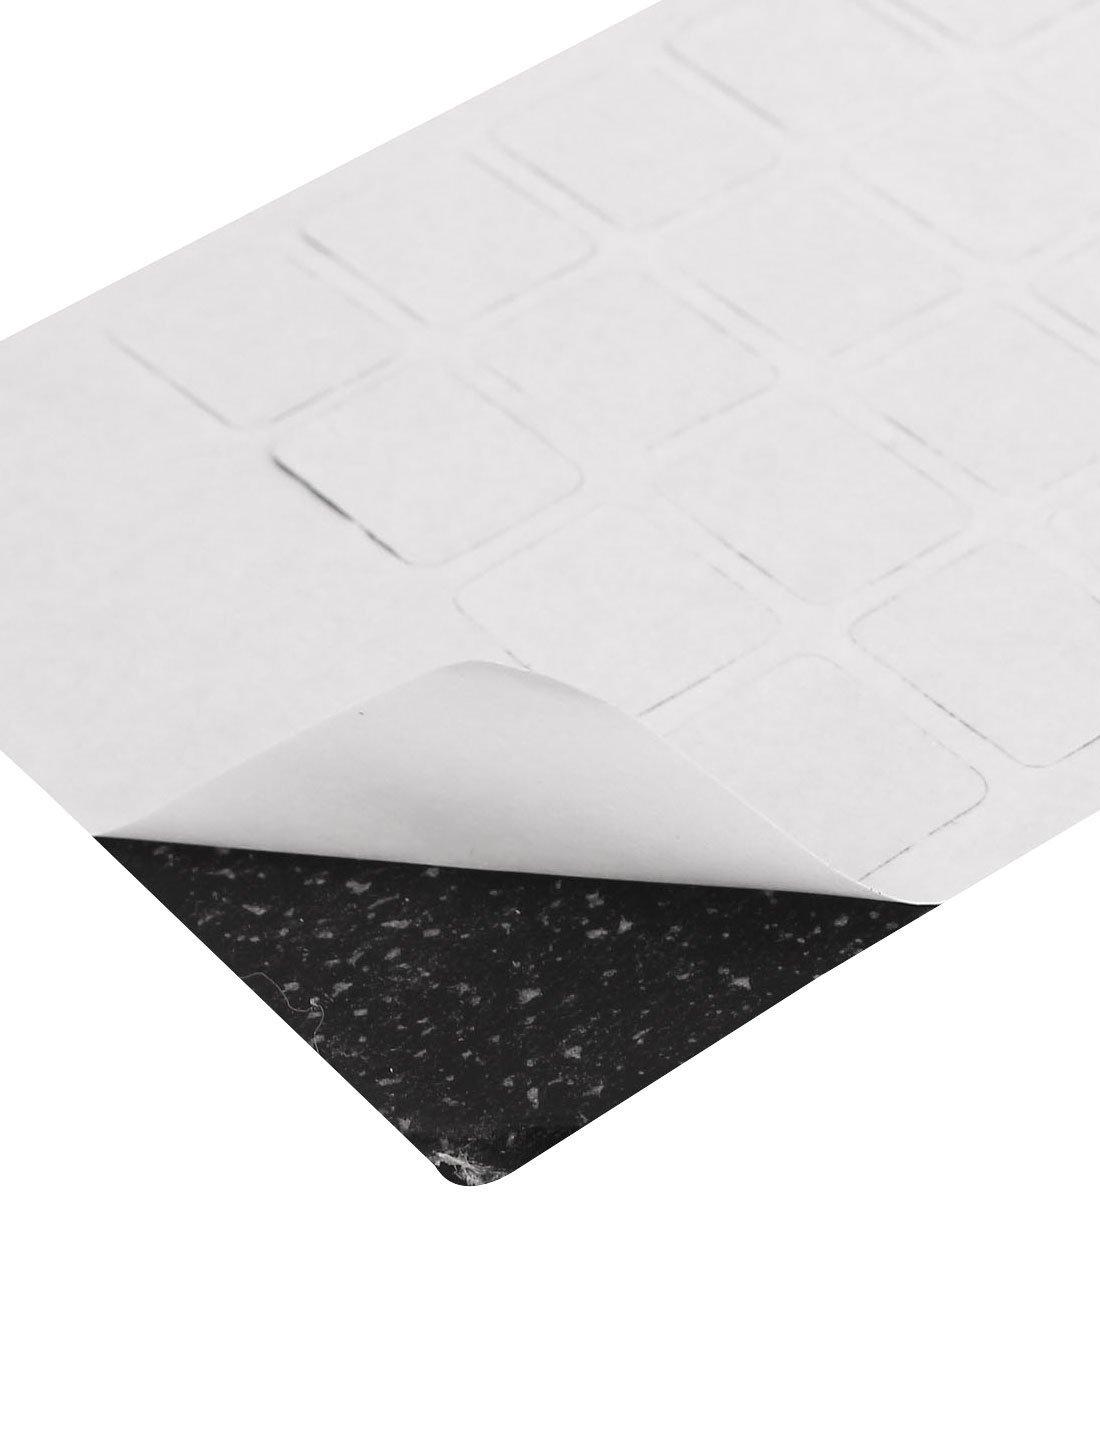 Amazon.com: eDealMax Letras Blancas Arabic Keyboard Layout Etiqueta Negro Para PC portátil: Electronics